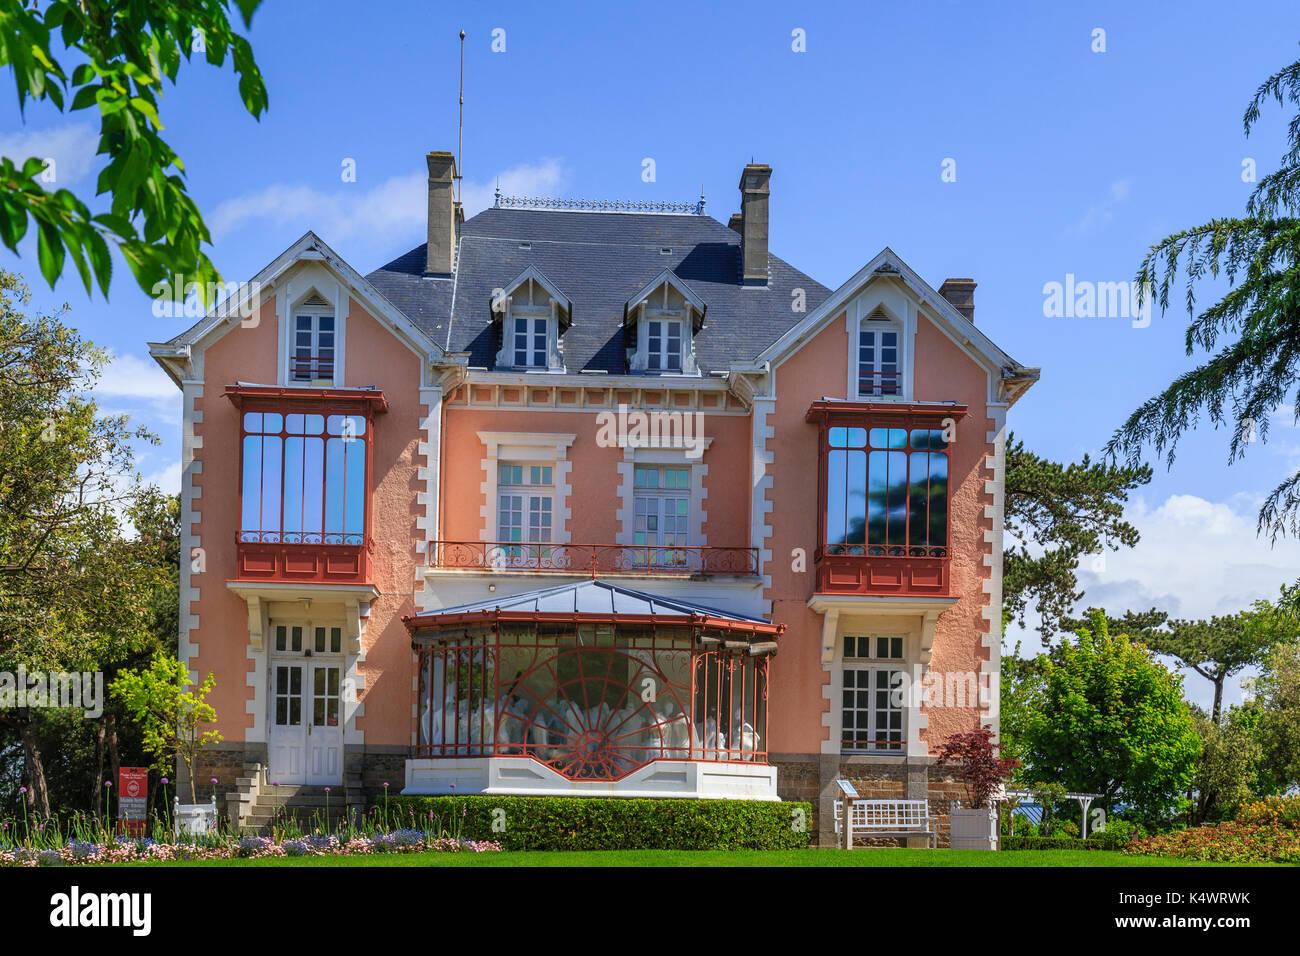 France, Manche (50), Cotentin, Granville, Musée Christian Dior, la villa Les Rhumbs // France, Manche, Cotentin Stock Photo